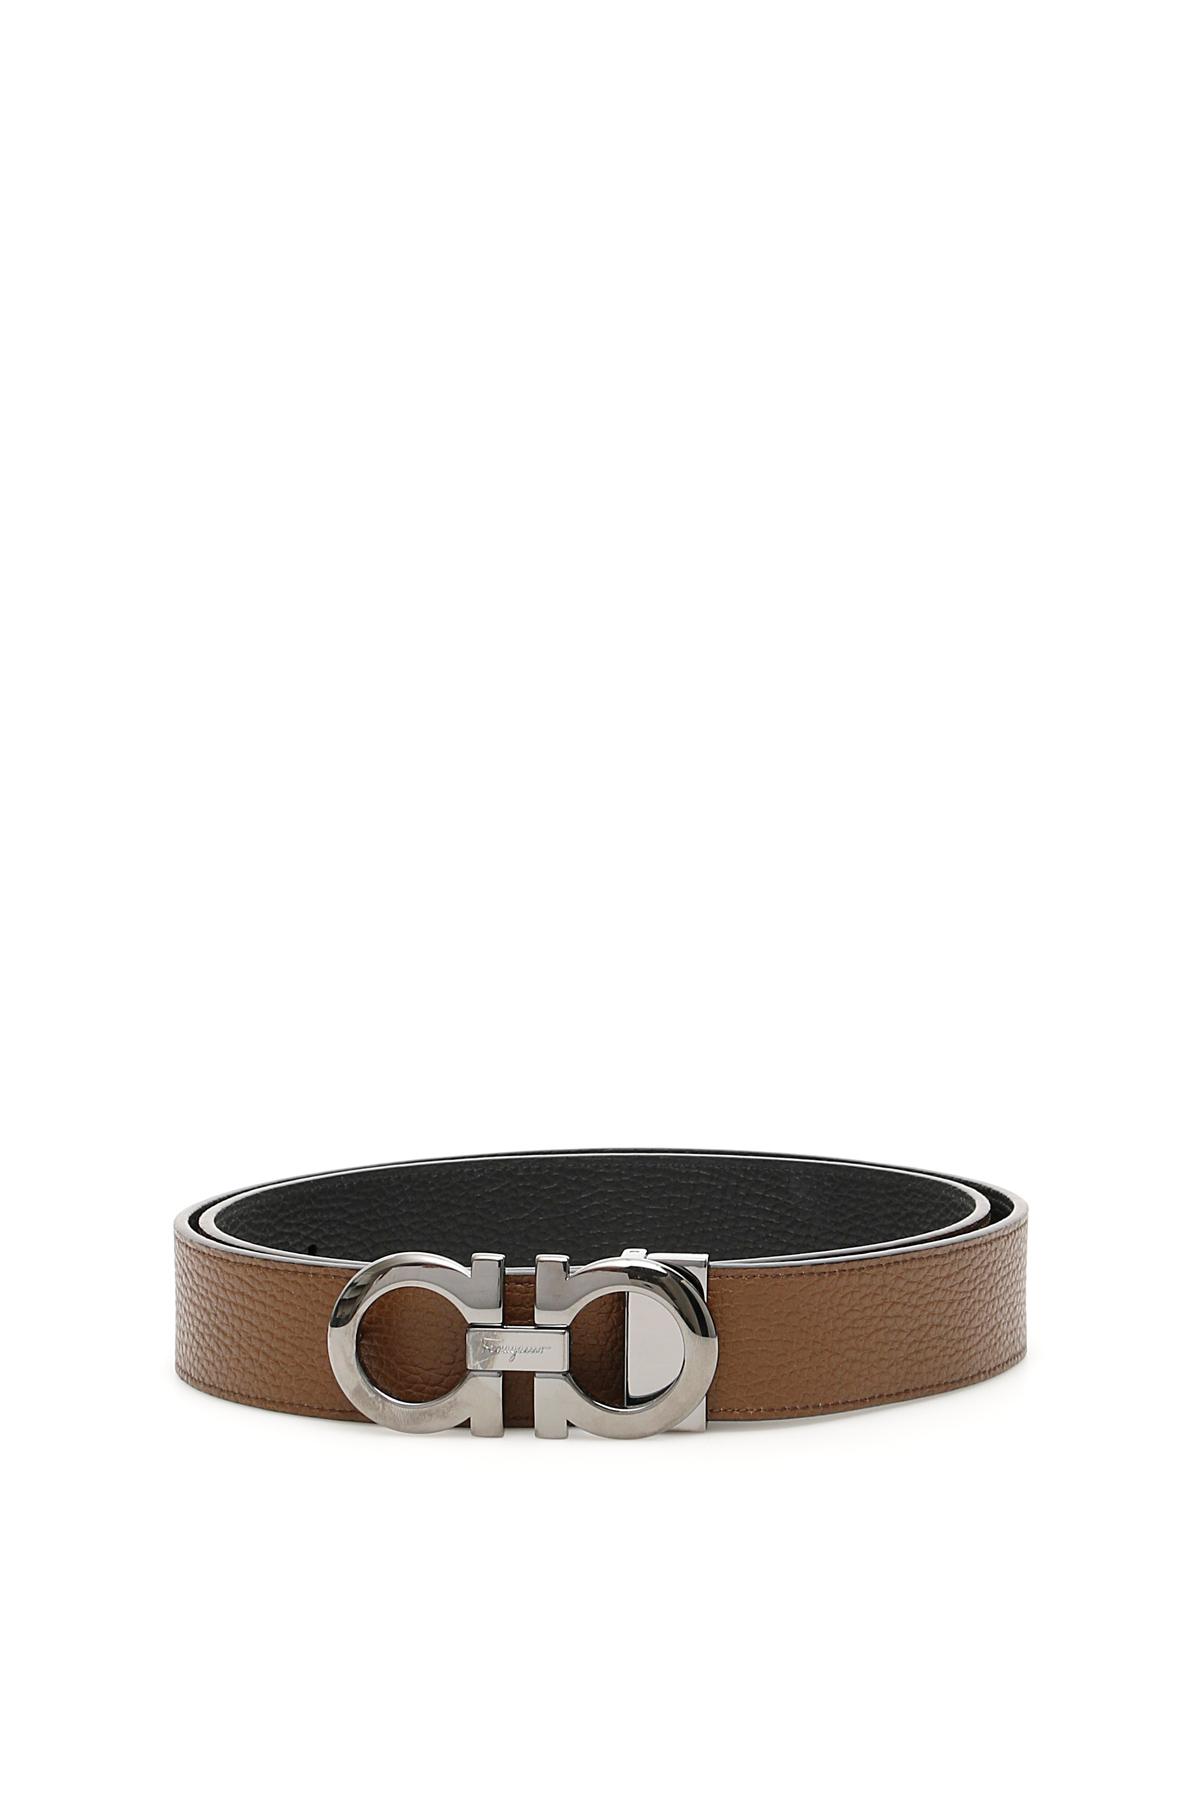 SALVATORE FERRAGAMO REVERSIBLE DOUBLE GANCIO BELT 115 Brown, Black Leather